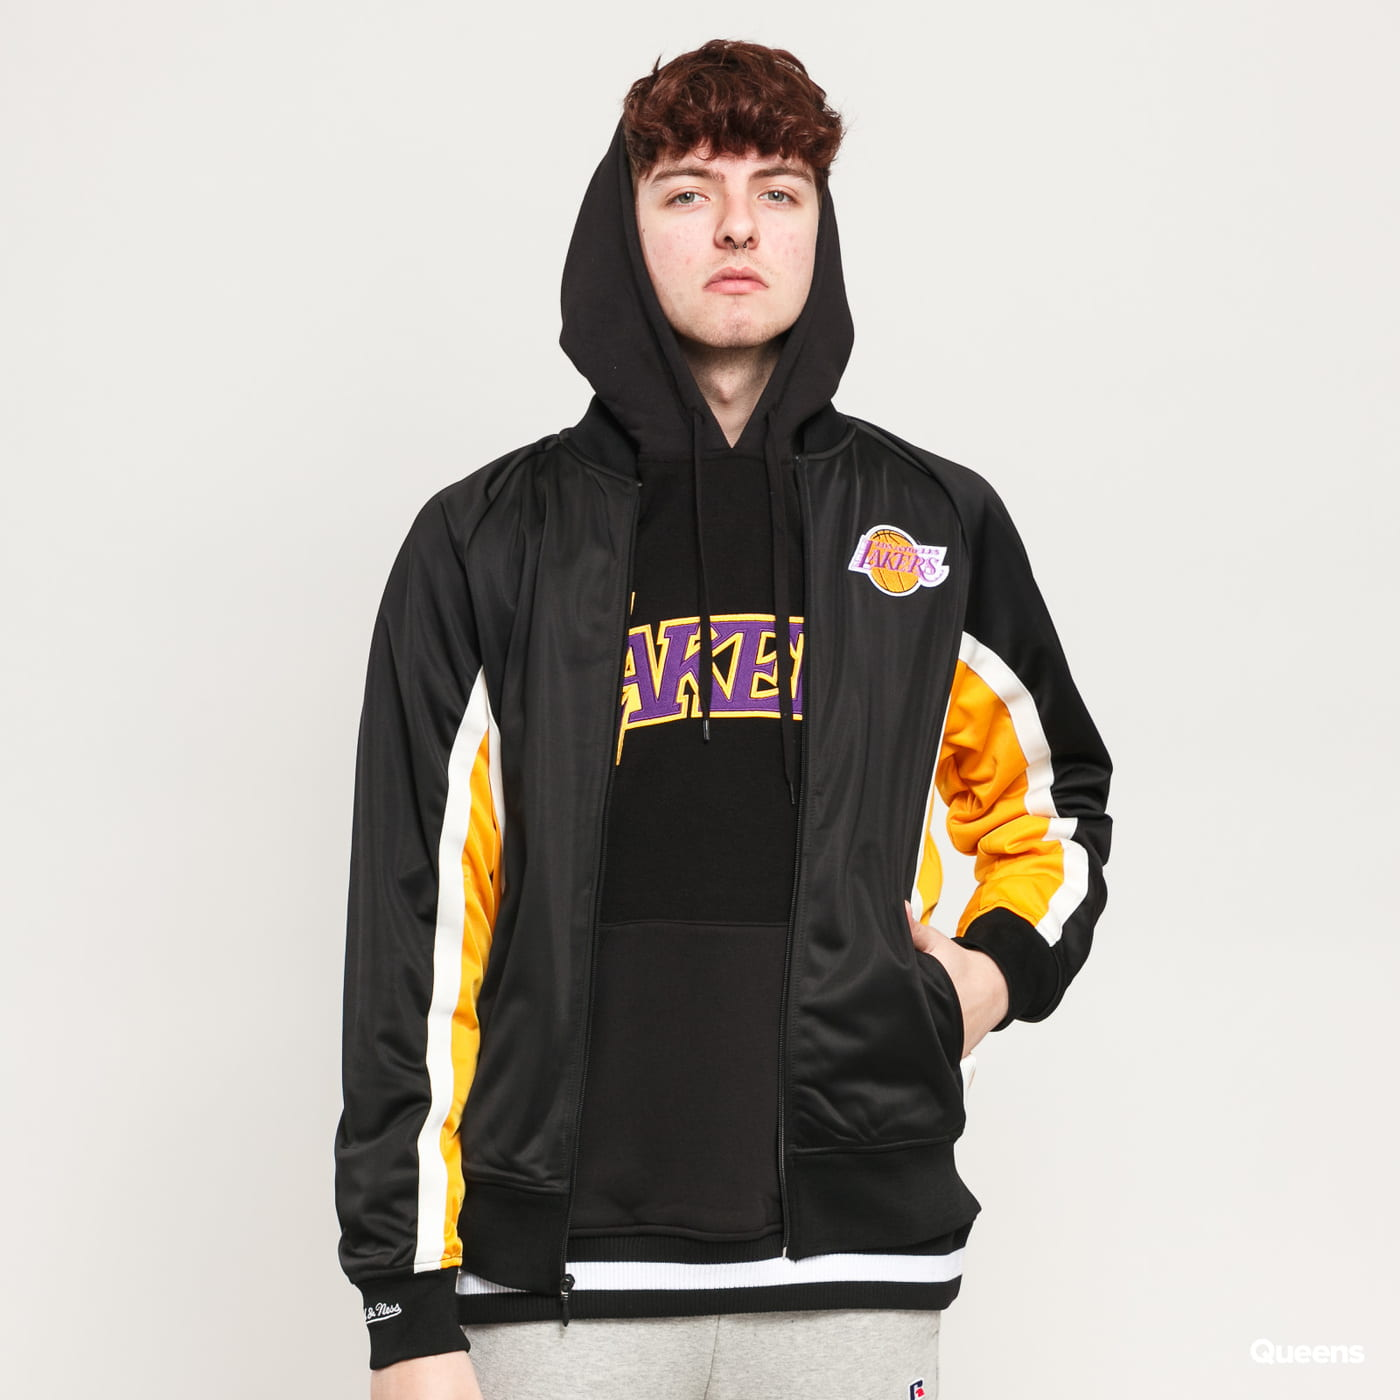 Sweatshirt Hoodie Mitchell Ness Championship Game Track Jacket La Lakers Black Yellow White Queens